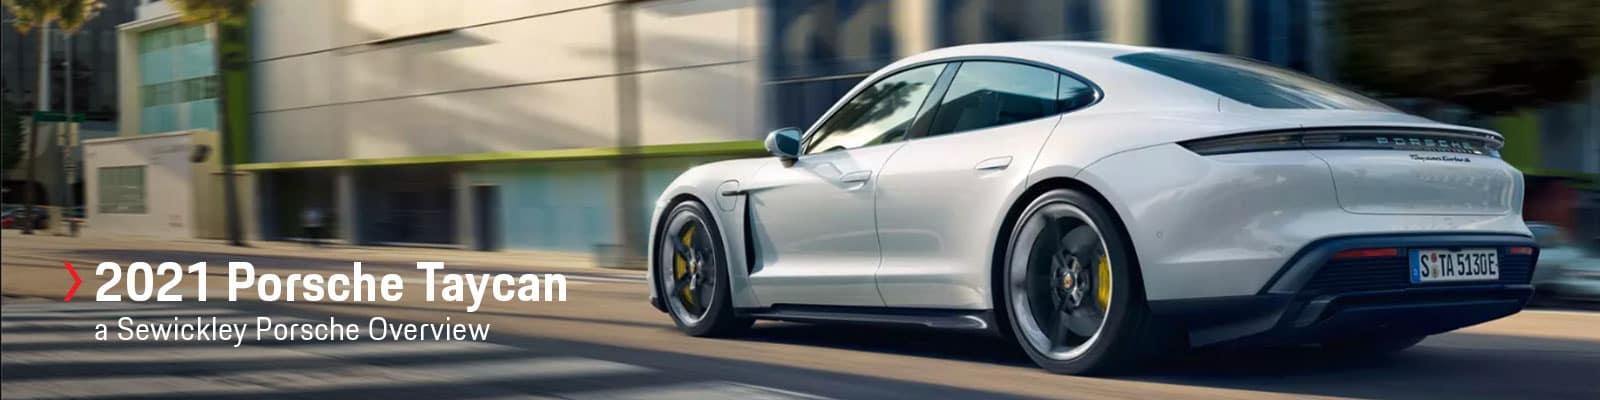 2021 Porsche Taycan Model Review at Sewickley Porsche